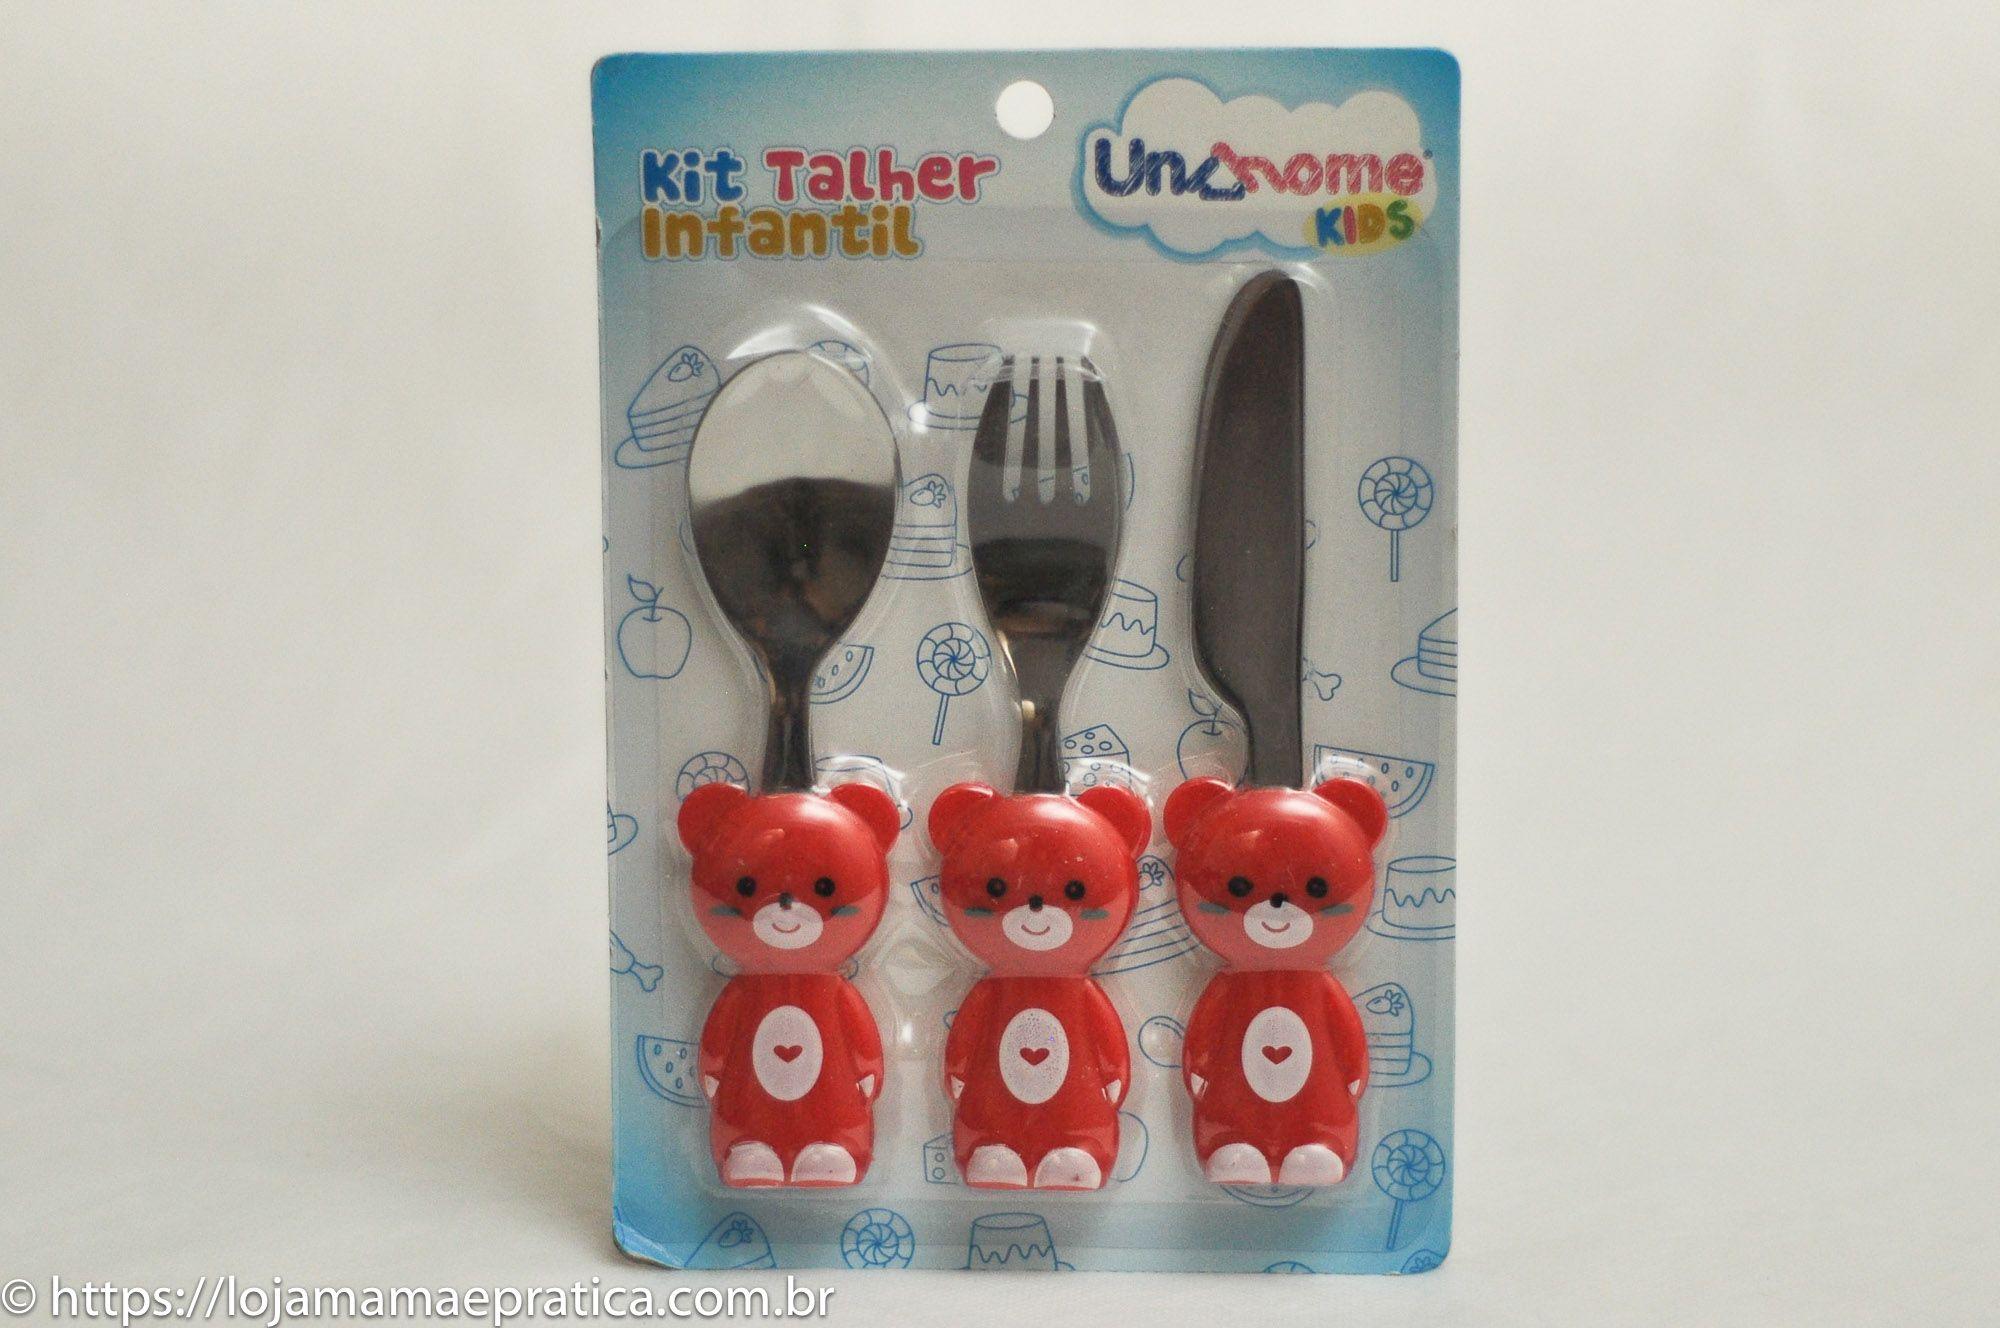 Kit Talher Infantil - Vários bichinhos